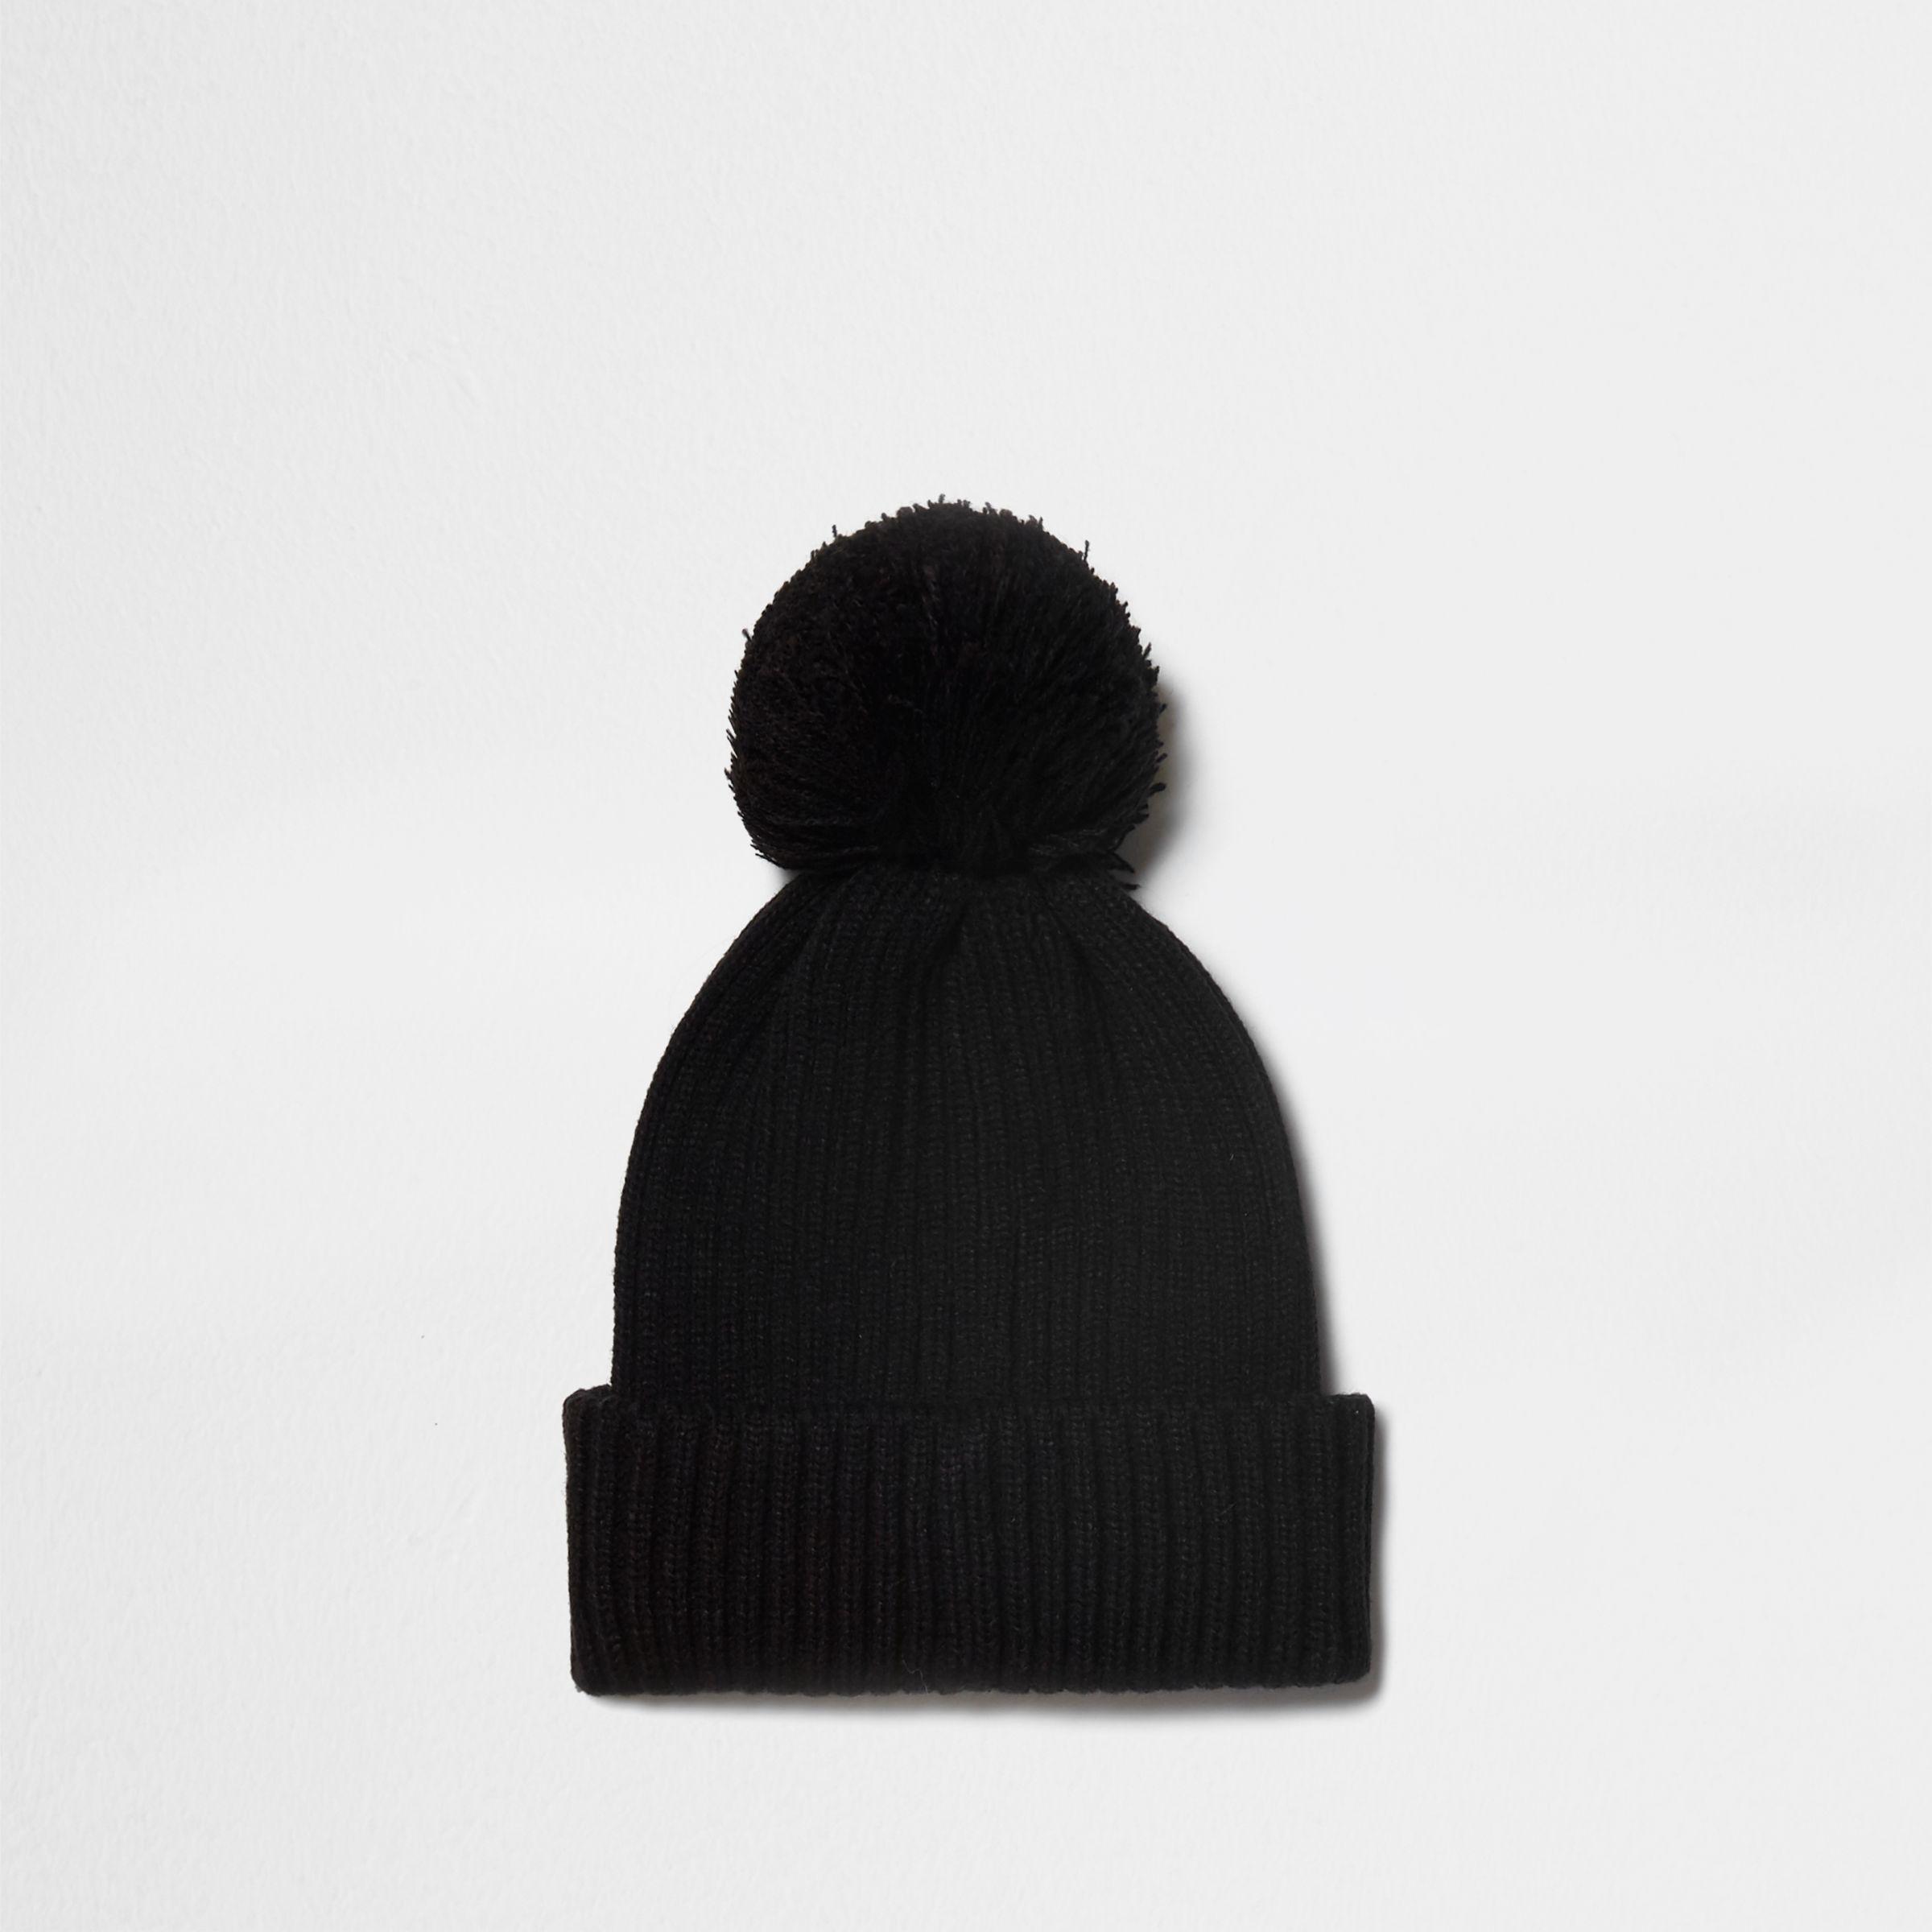 ec44bef871e Men s Black Pom Pom Ribbed Knit Beanie Hat Black Pom Pom Ribbed Knit Beanie  Hat